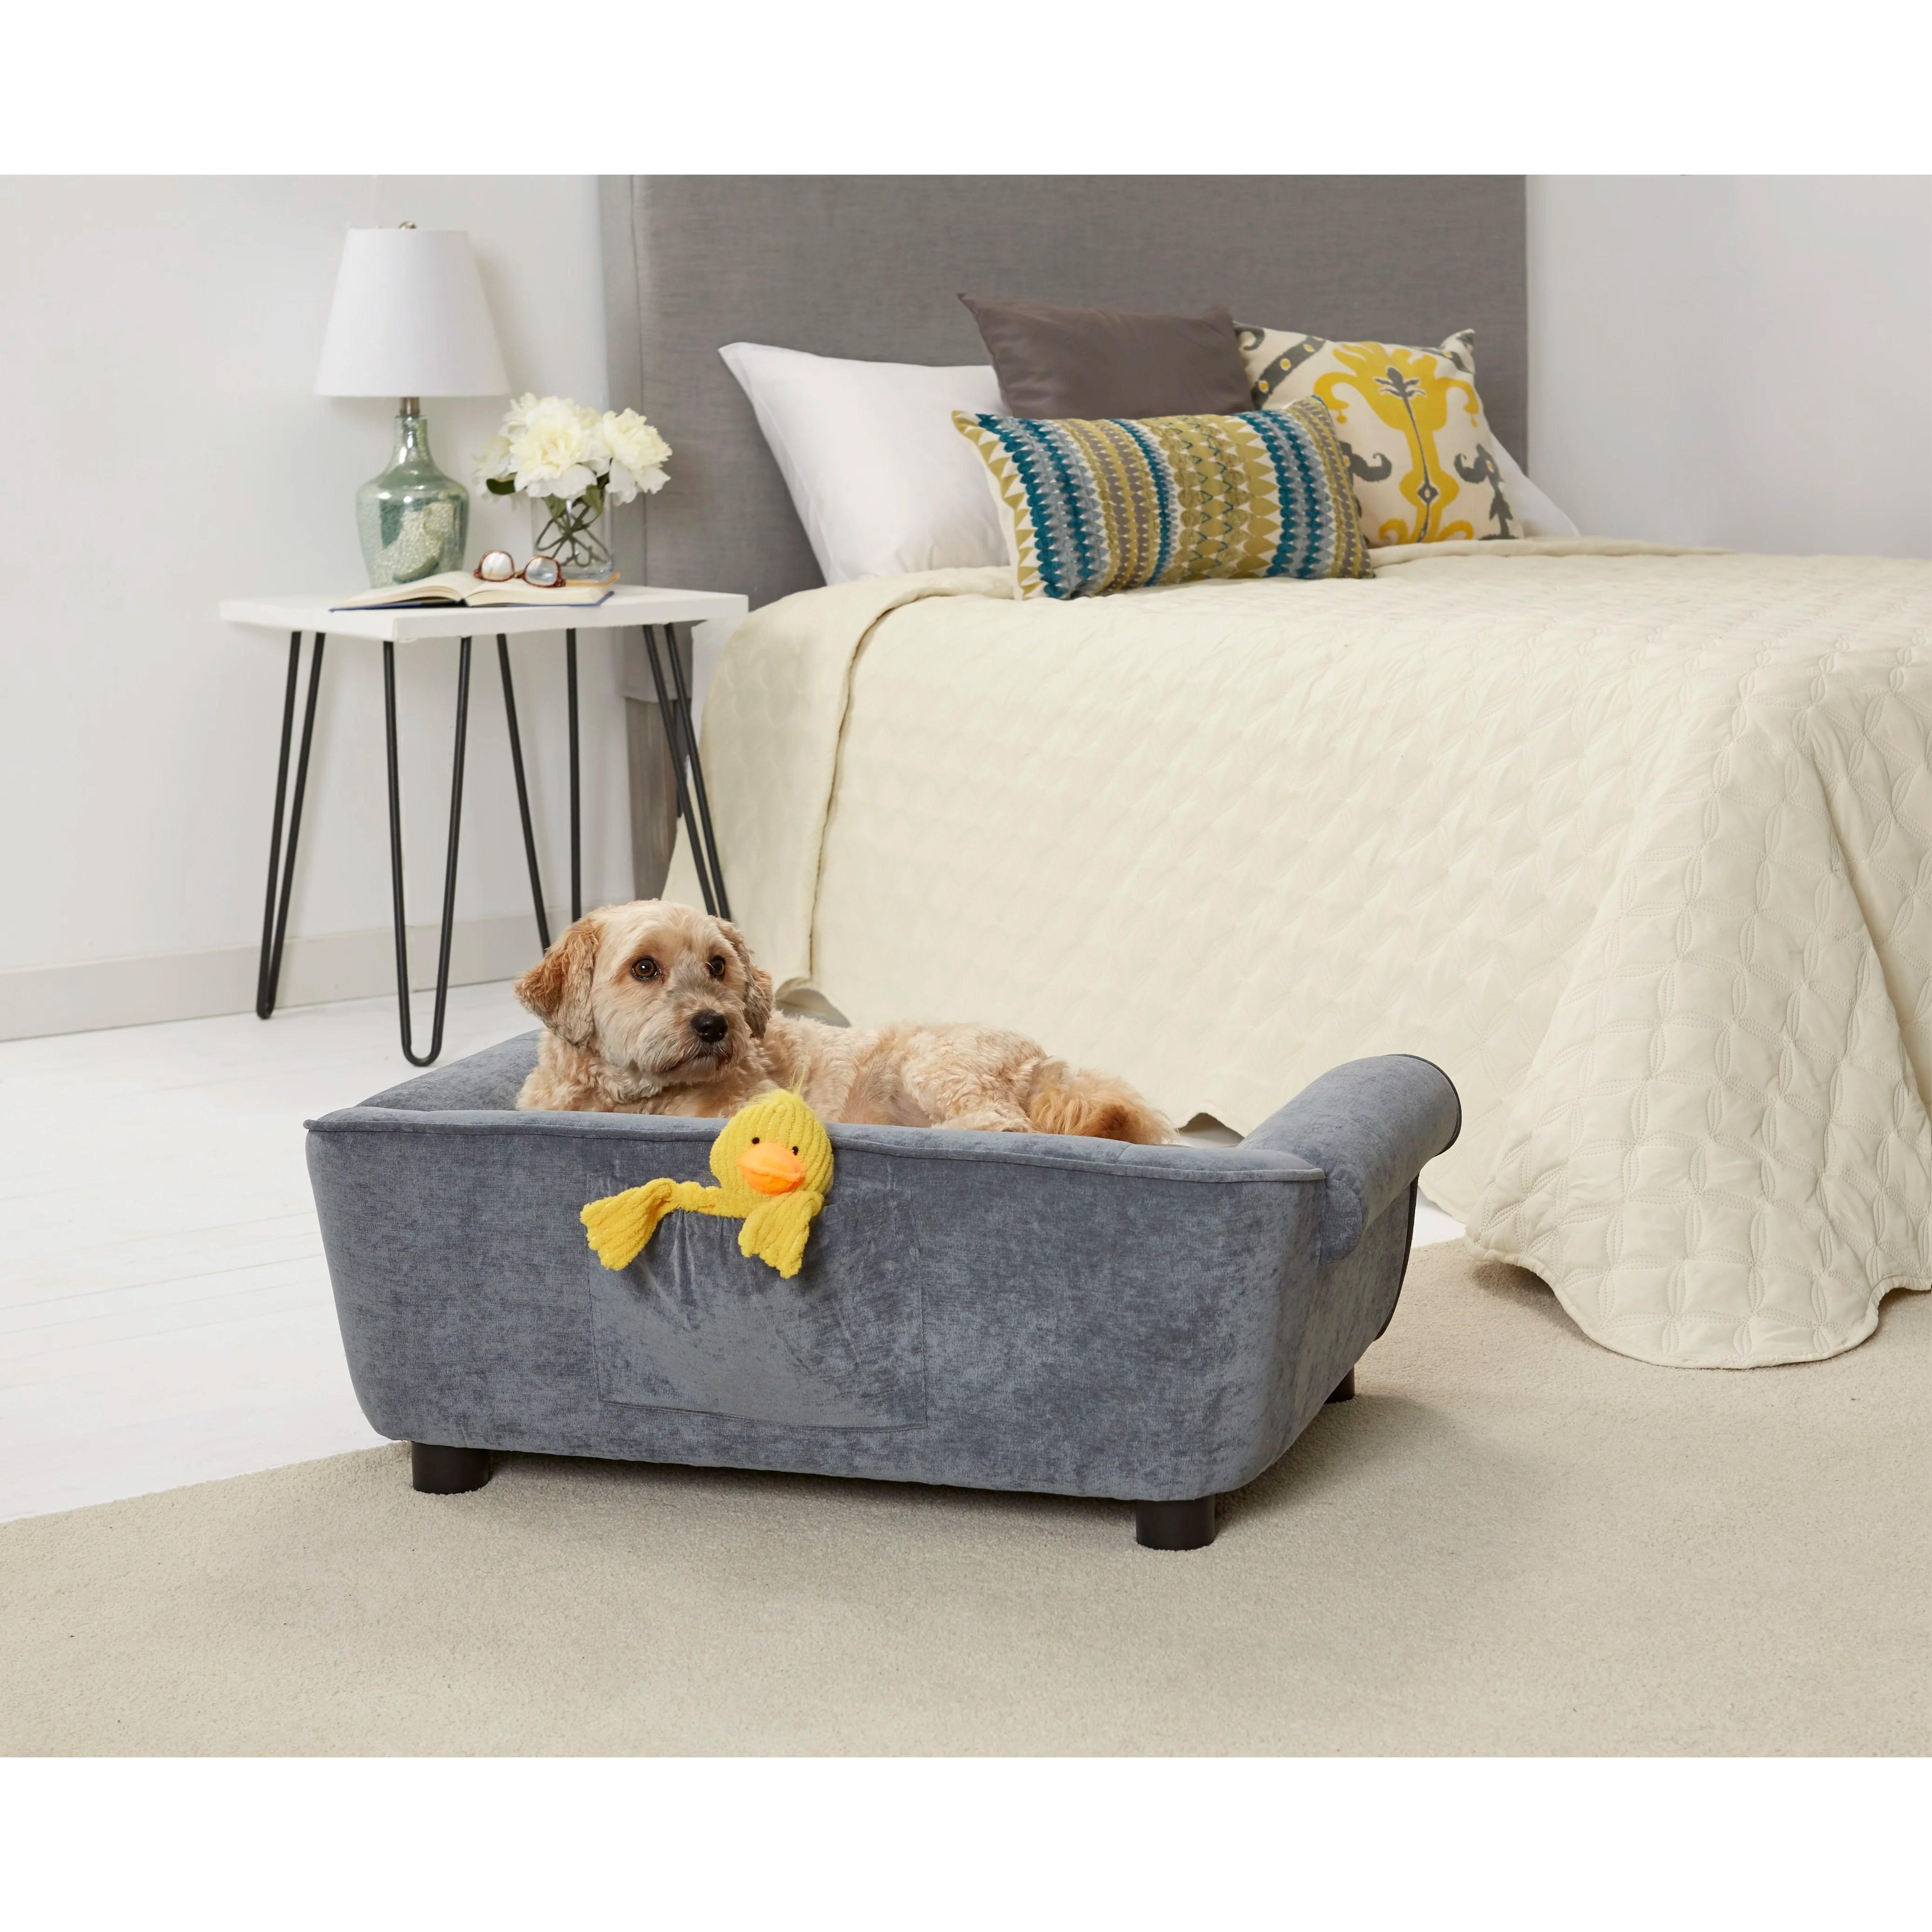 enchanted home mackenzie pet sofa madeline 3 piece leather set dreamcatcher velvet dog with